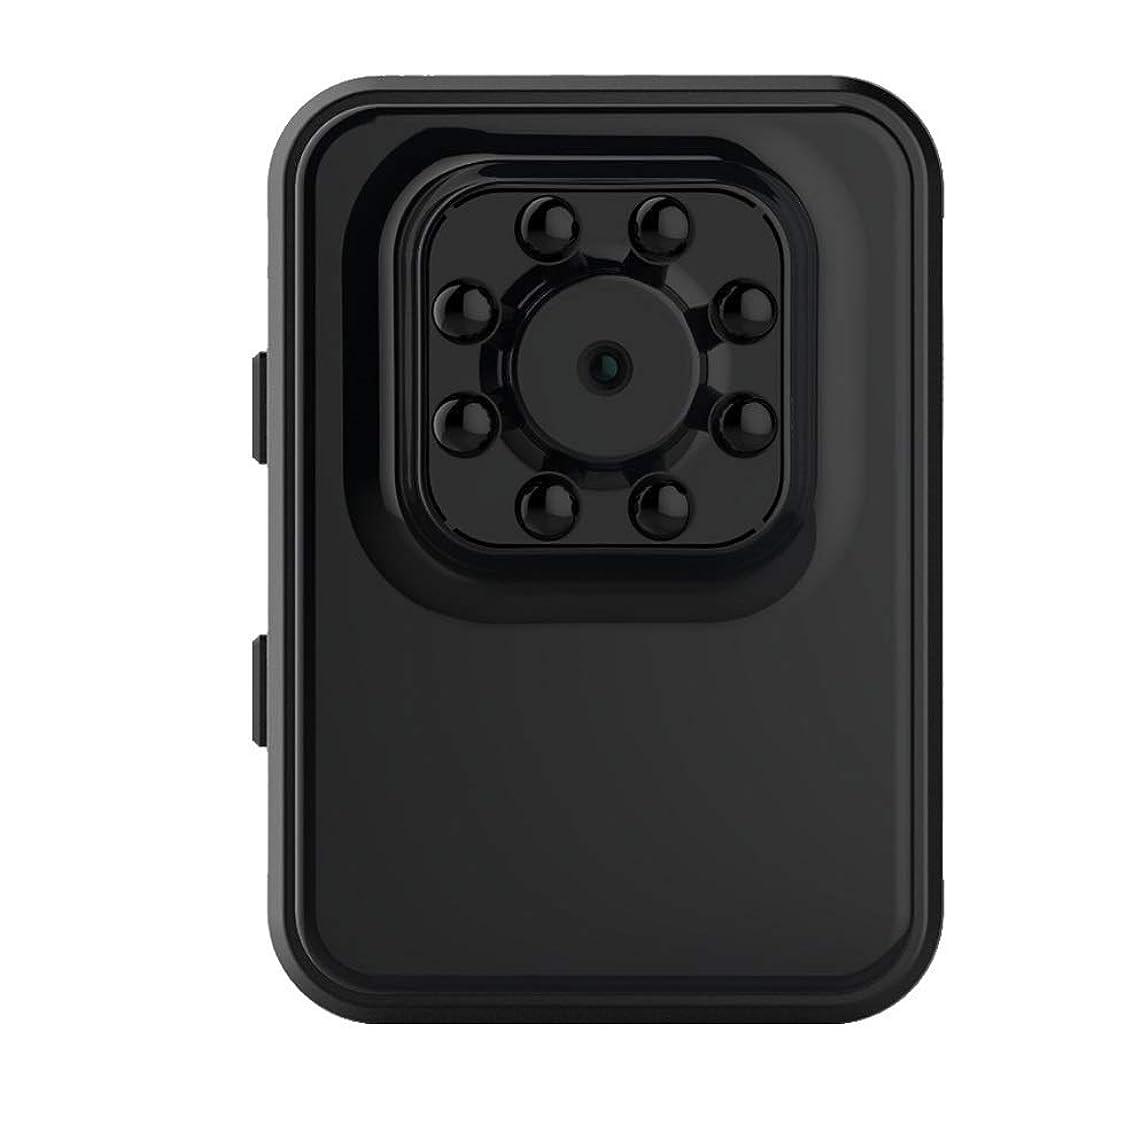 CaméraDe Sport、CaméraExtérieureSans Fil Wifi HD、Webcam Intelligente、1080p HD、12 Millions DeCamérasUltra Claires セットアップが簡単